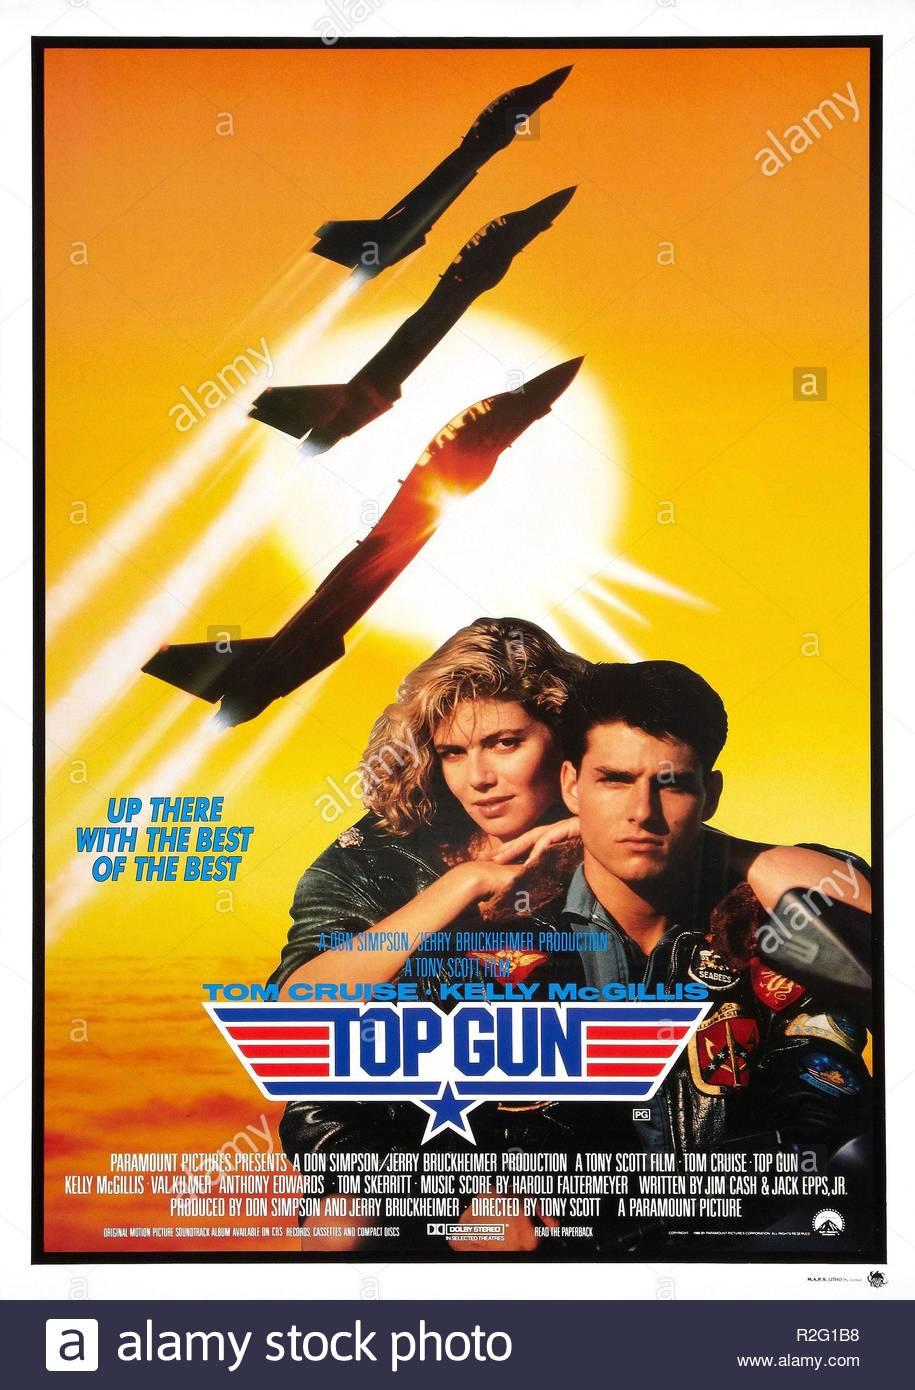 Top Gun  Year : 1986 USA Director : Tony Scott Kelly McGillis, Tom Cruise Movie poster (USA) - Stock Image